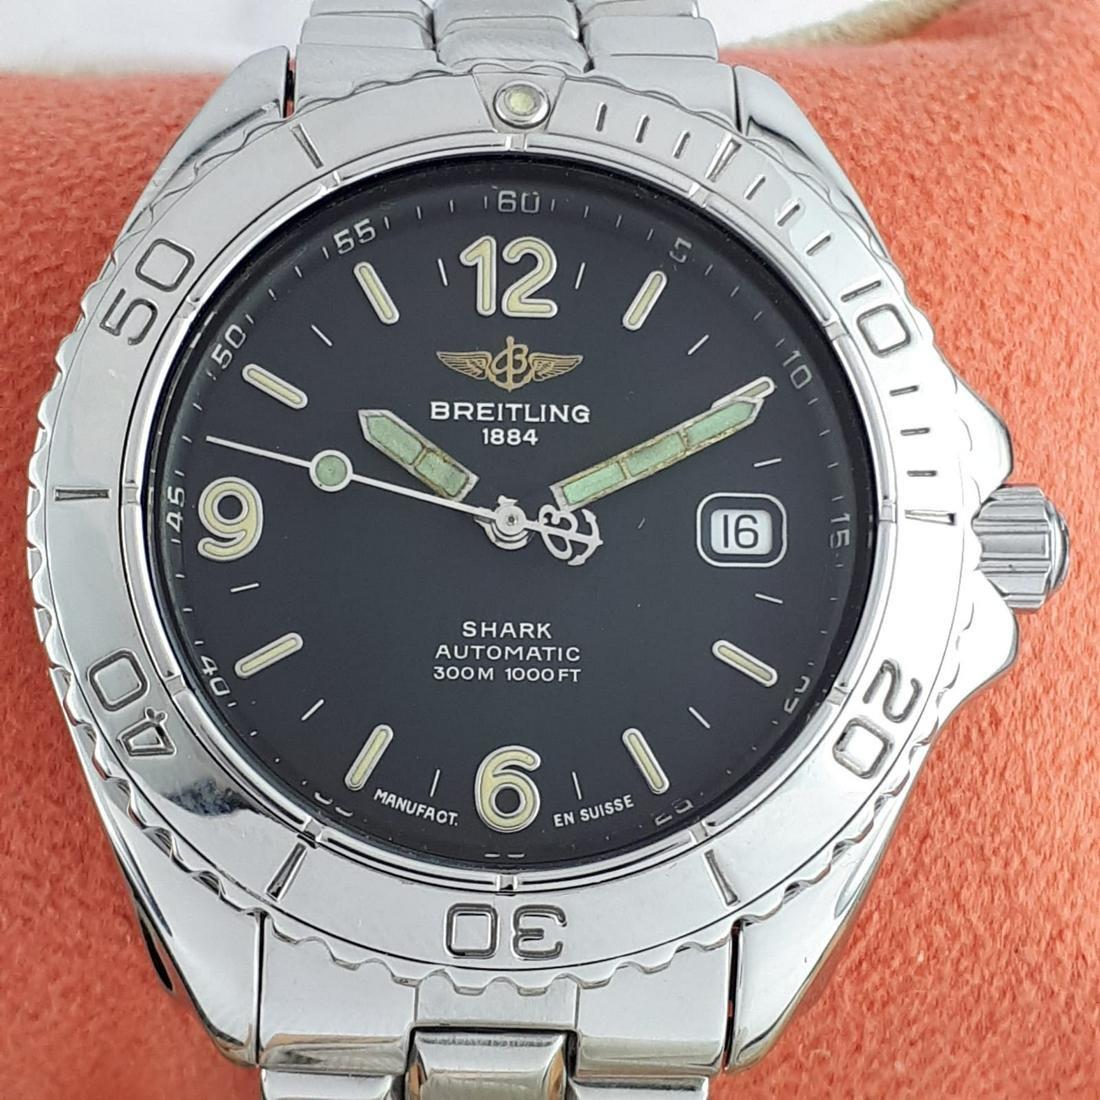 Breitling - Shark Automatic - Ref: A17605 - Men -